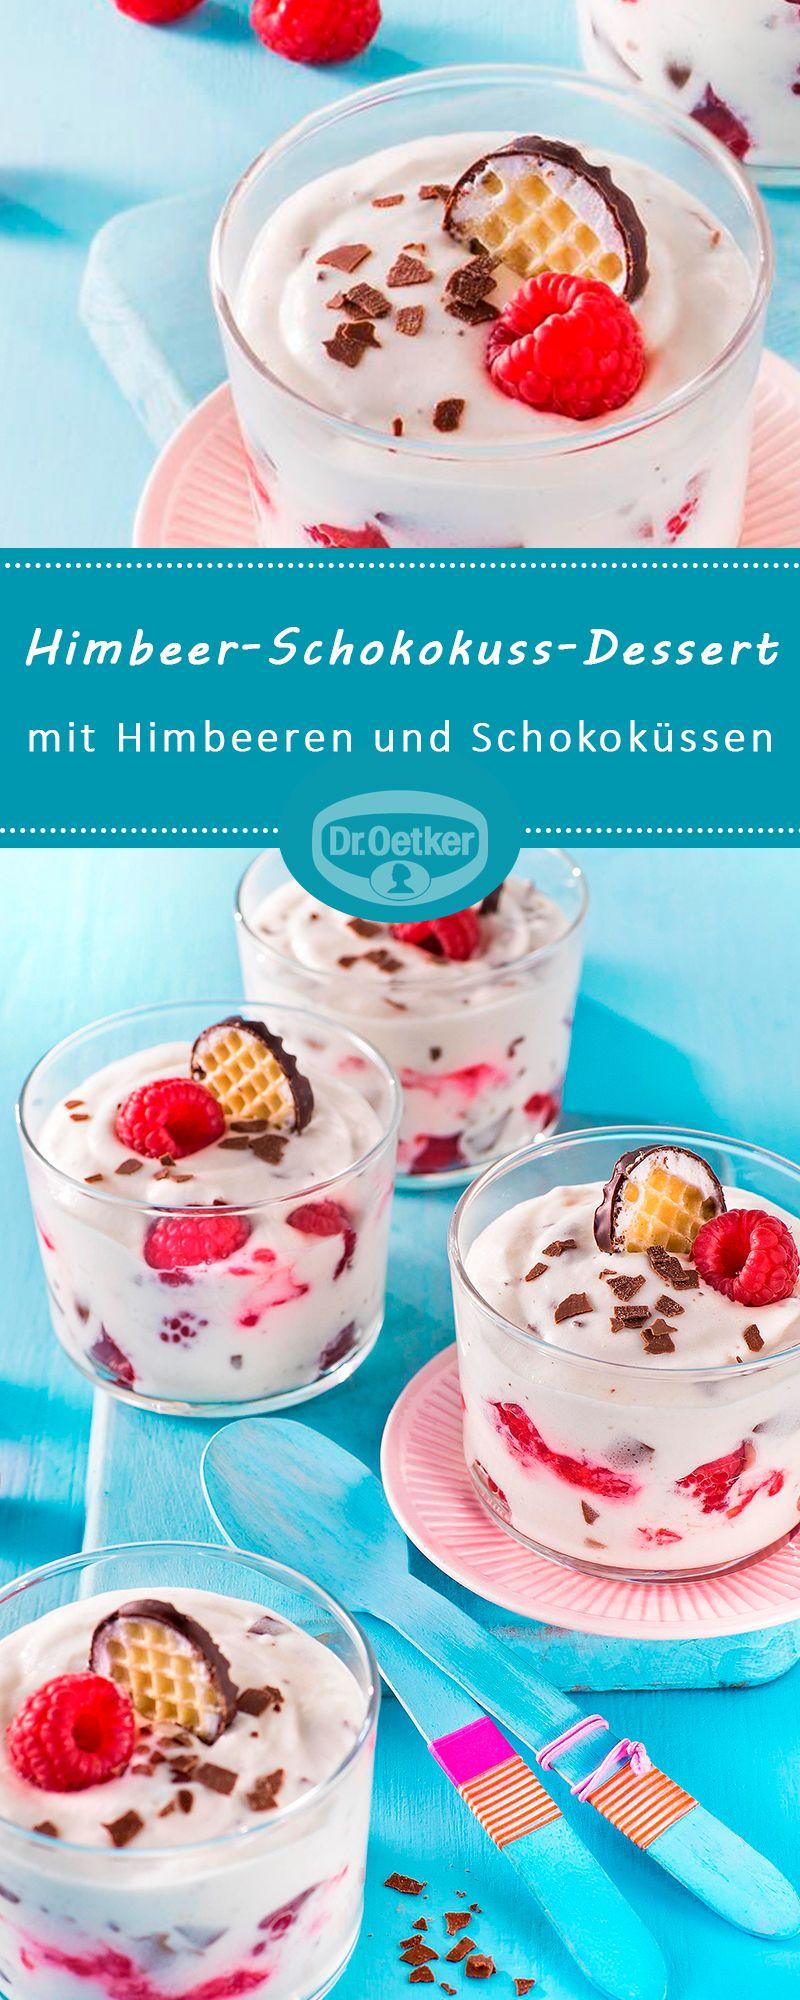 Himbeer-Schokokuss-Dessert #desserts